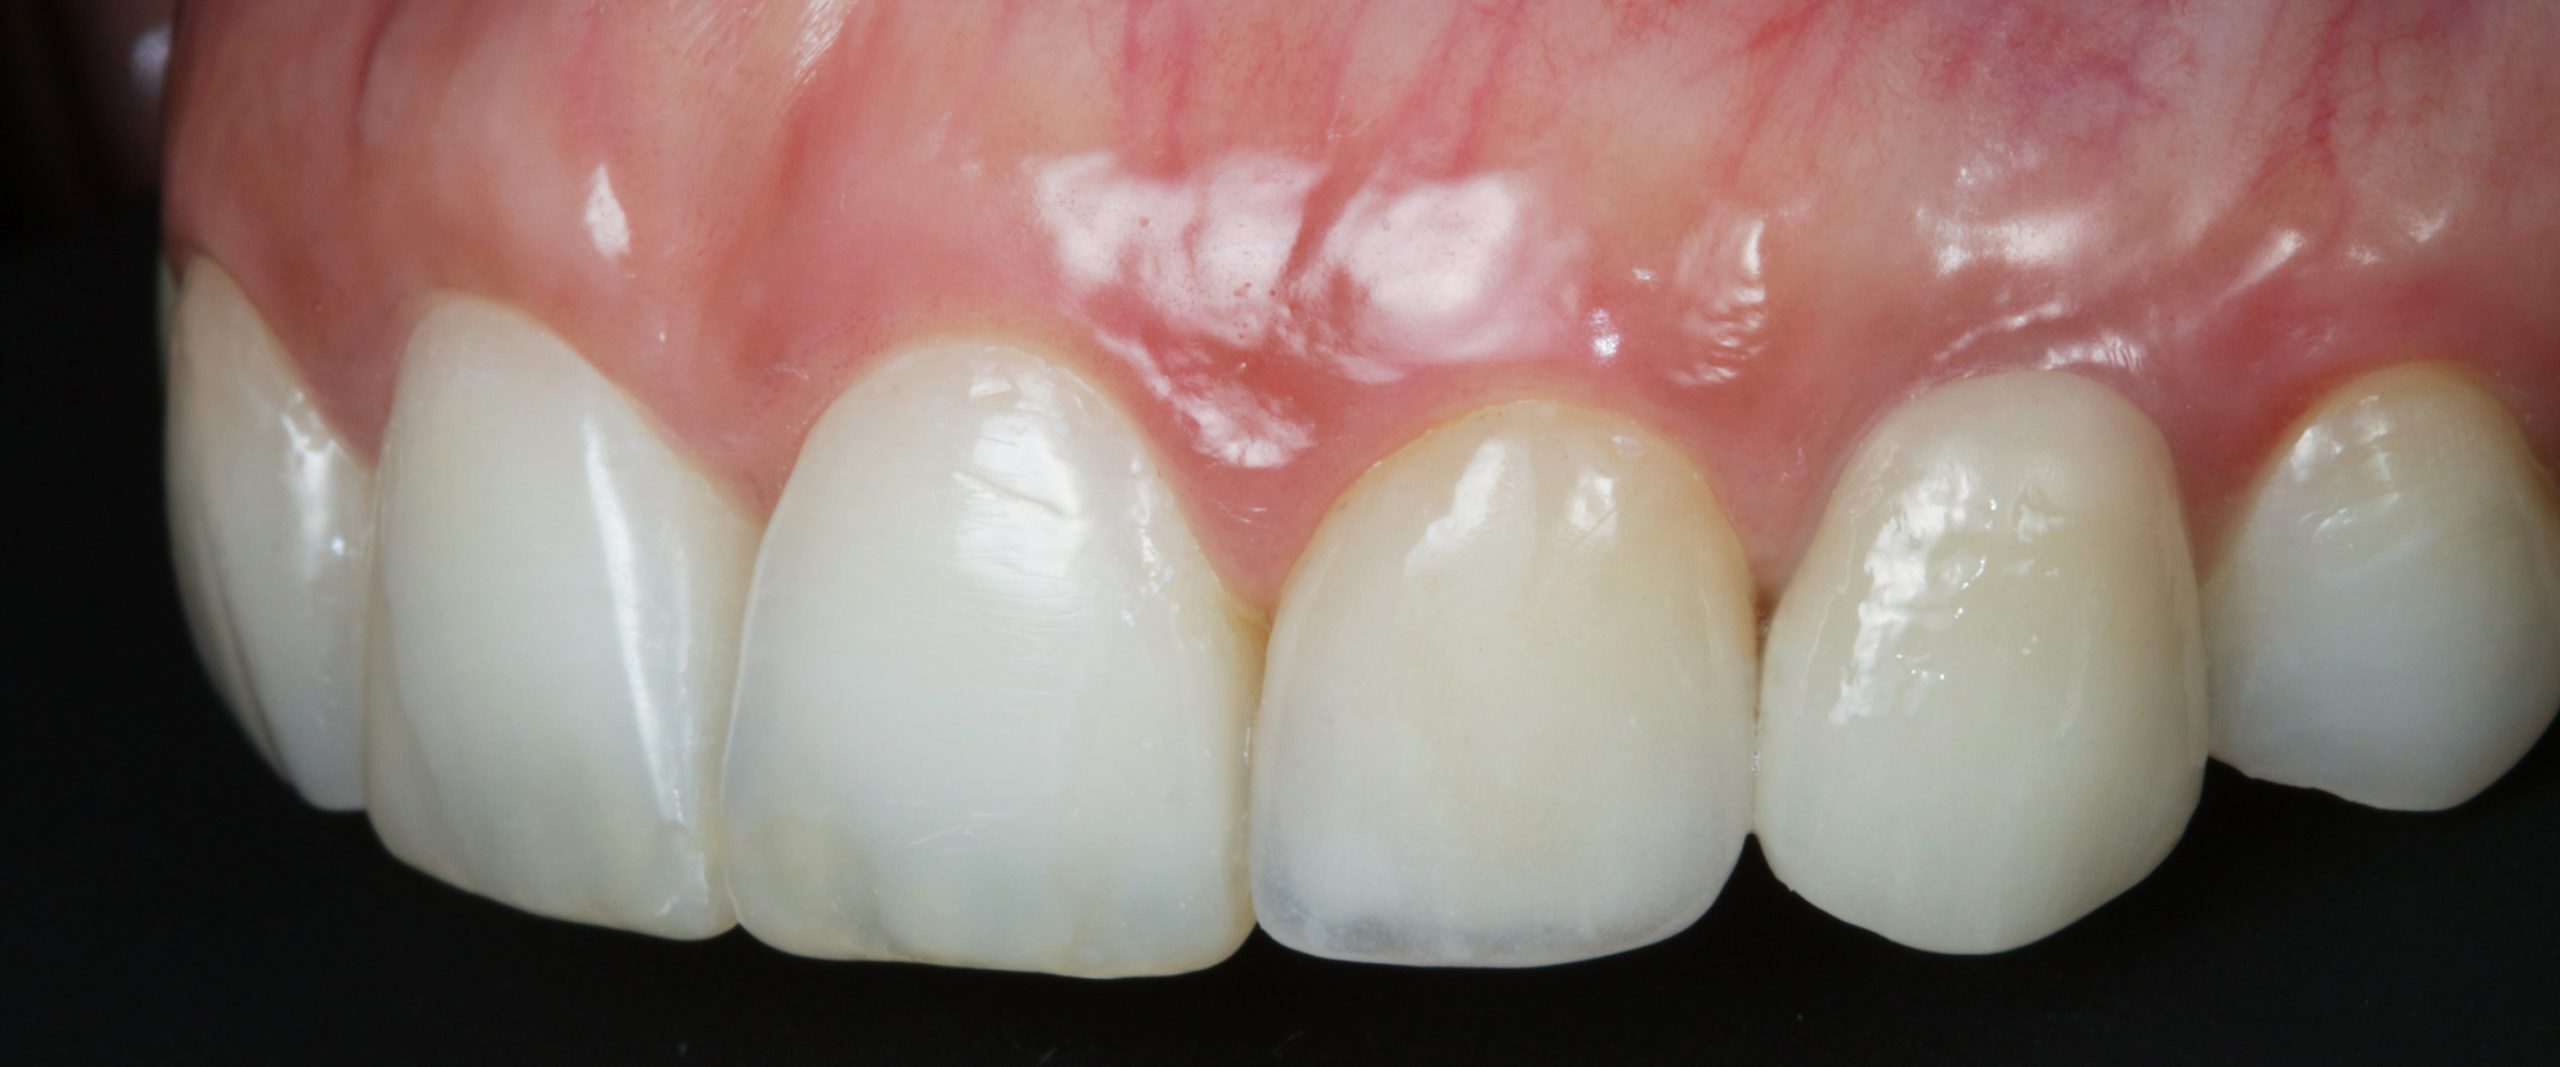 Dental soft tissue management